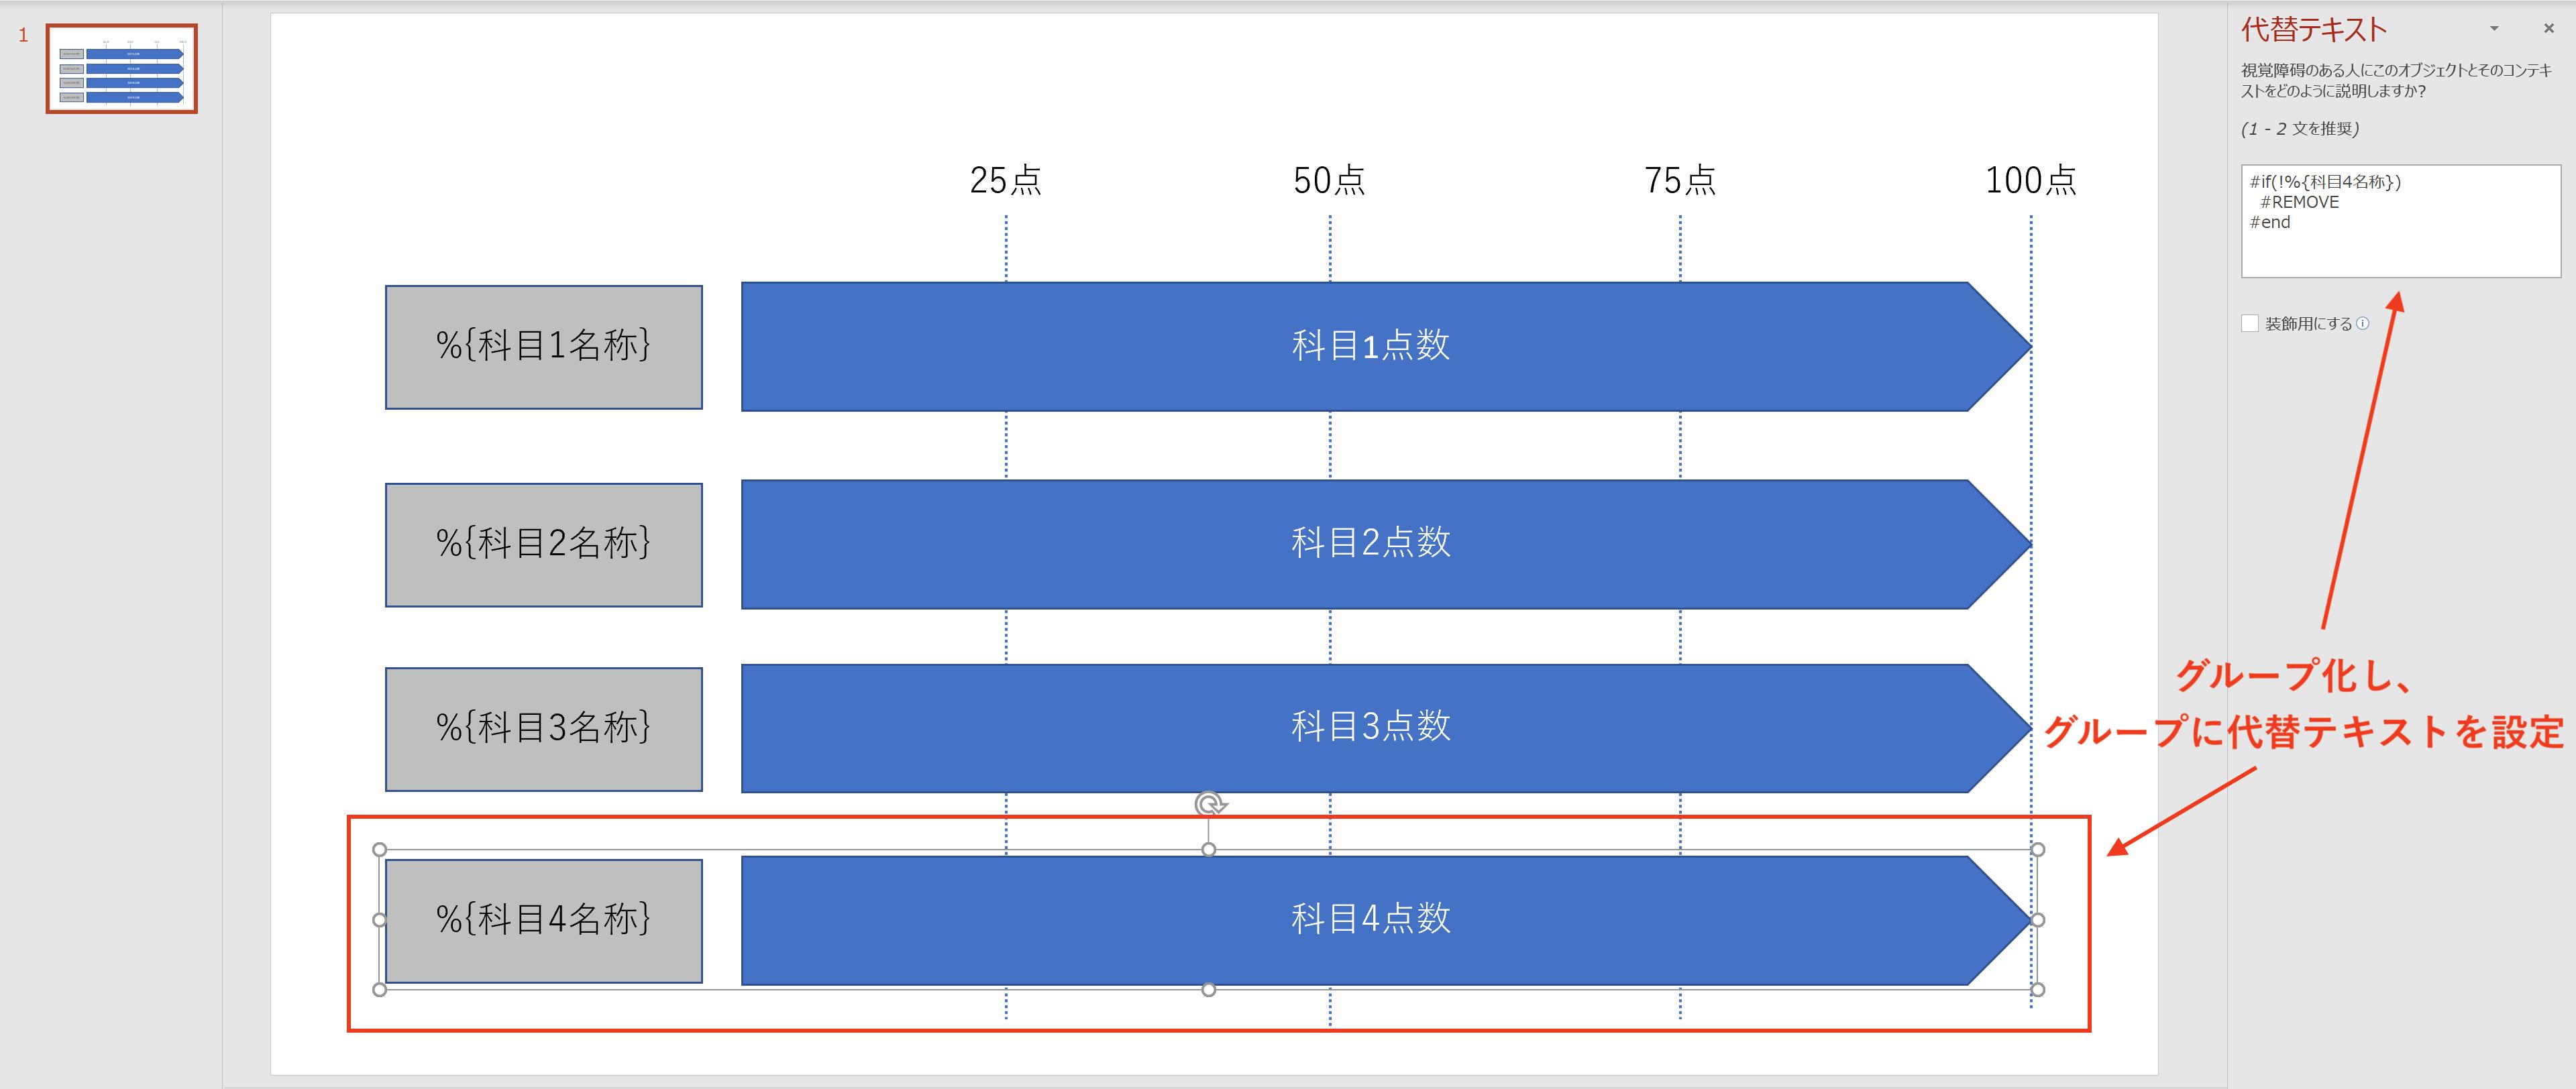 https://s3.ap-northeast-1.amazonaws.com/site.docurain.jp/blog/2021/01/スクリーンショット-2021-01-12-14.58.47.png